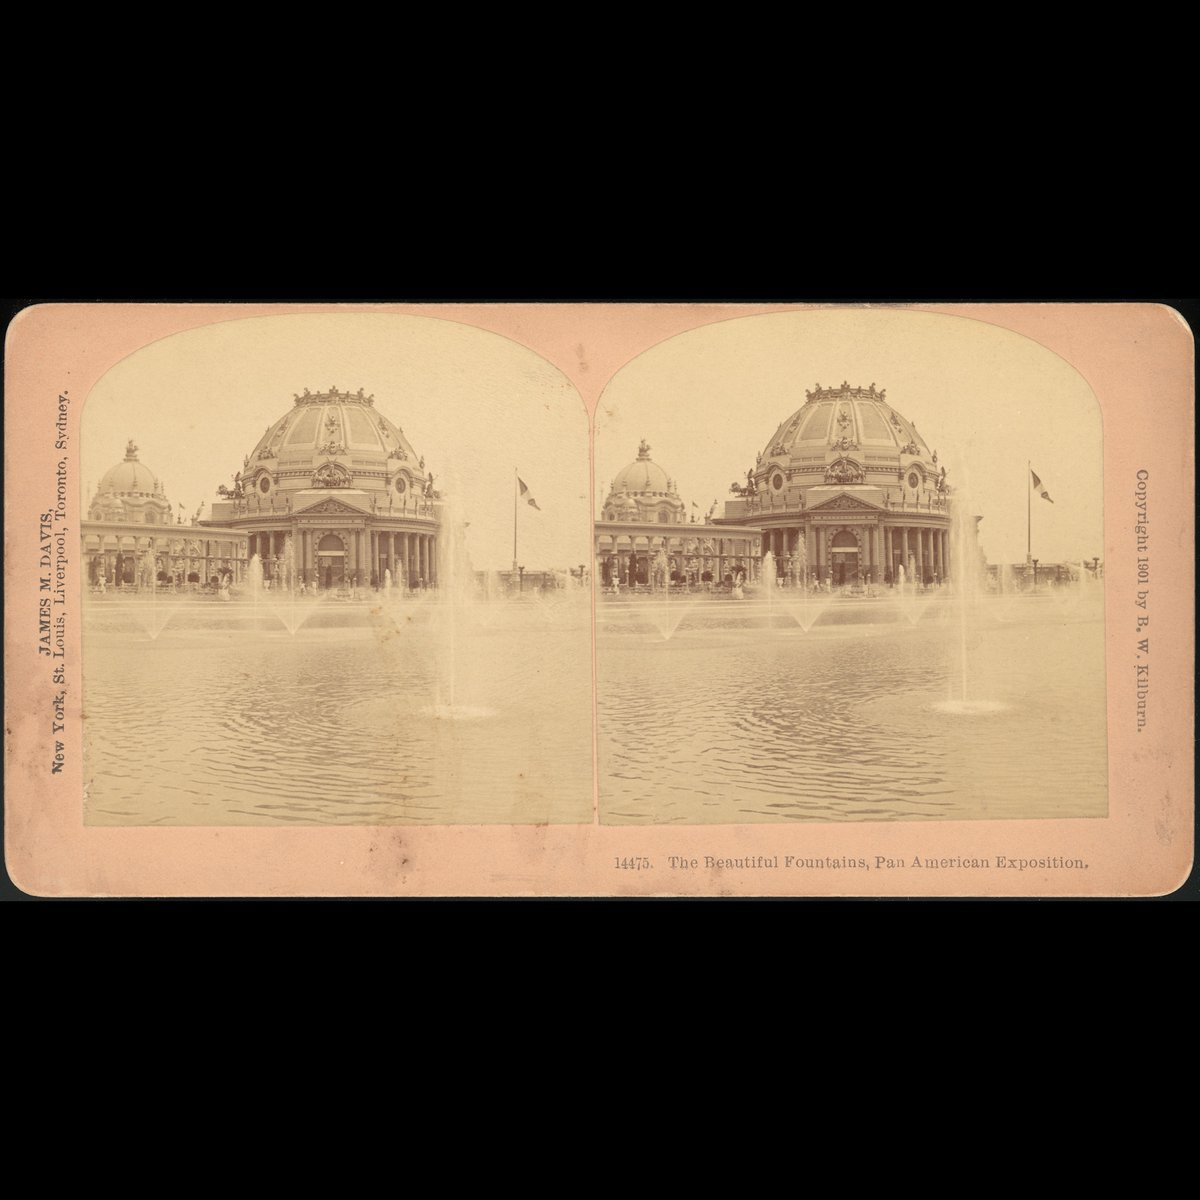 [Group of 3 Stereograph Views of the 1901 Pan American Exposition, Buffalo, New York] Stereographs created by: James M. Davis  #art #artwork #artlover #artaccount #arte #アート #艺术 #JamesM.Davis https://t.co/69BN4Td10Q